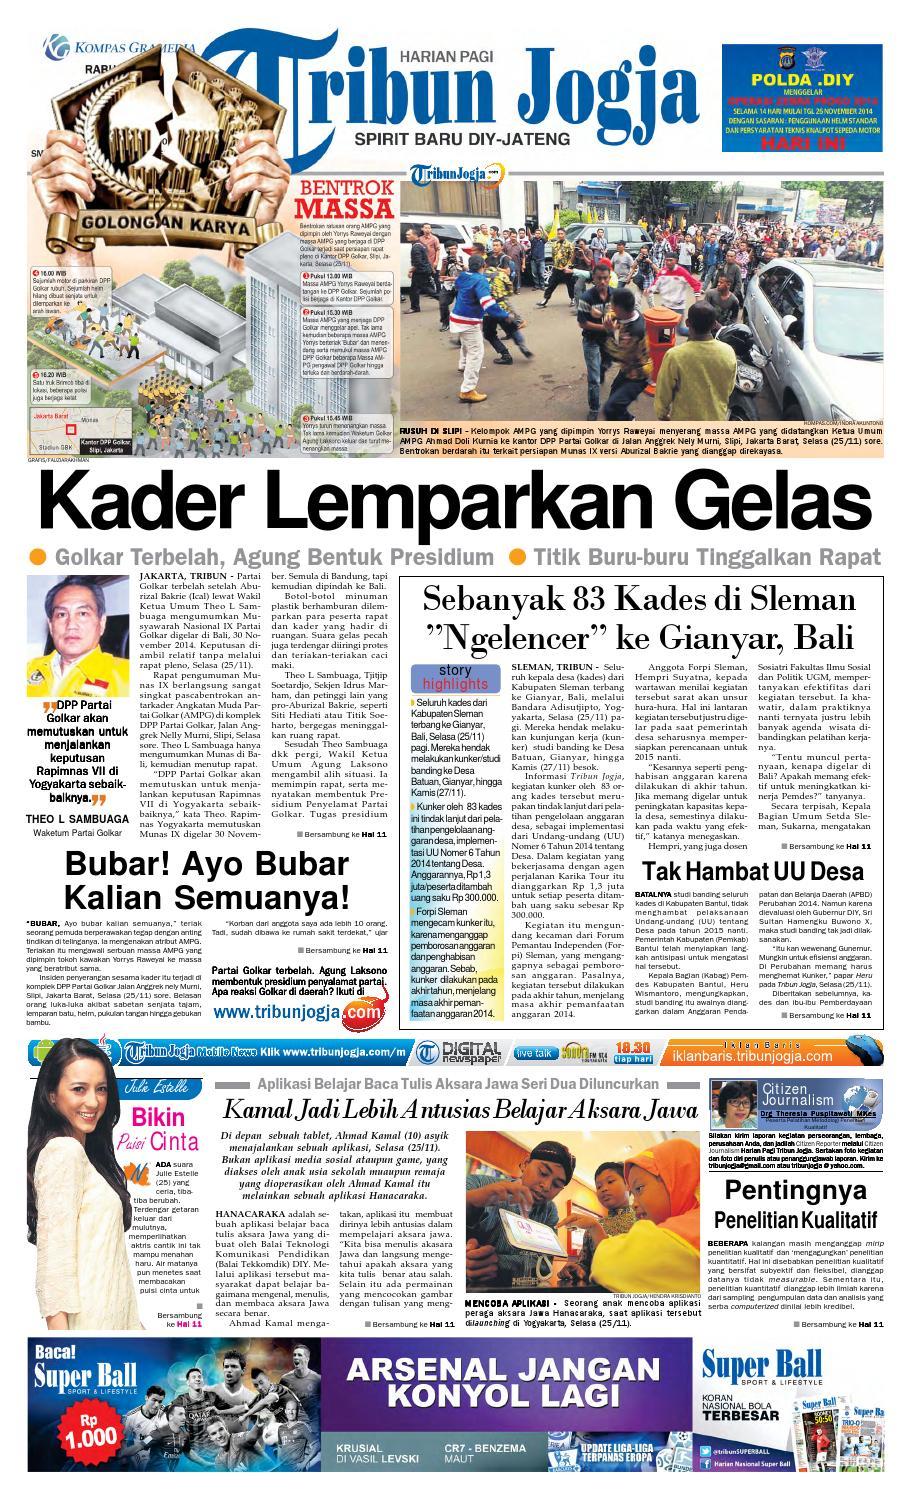 Tribunjogja 26 11 2014 By Tribun Jogja Issuu Produk Ukm Bumn Gaun Putih Maya Raisa Kebaya